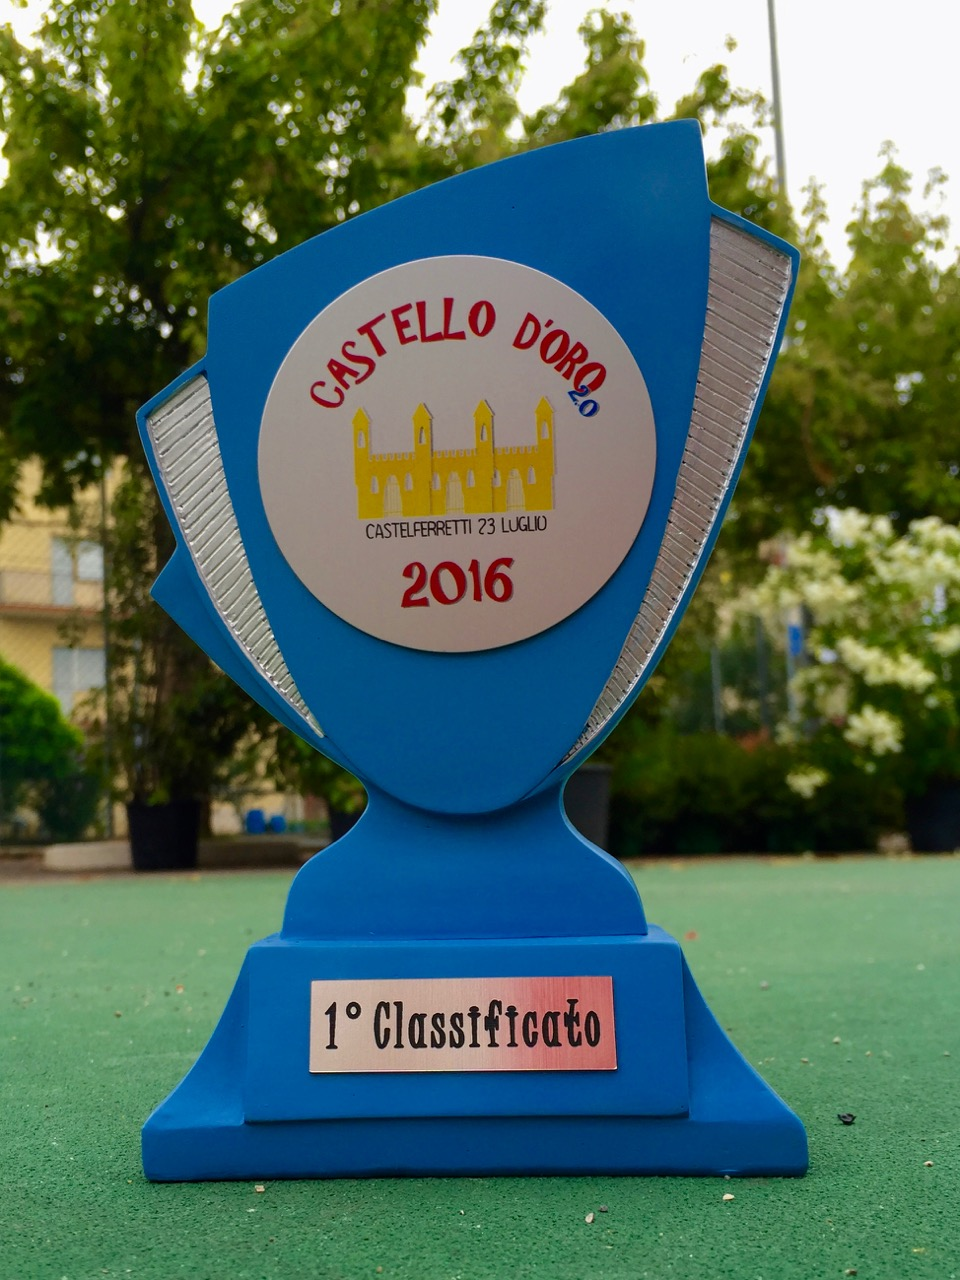 16-07-23 CASTELLO D'ORO 2016 - 97.jpg